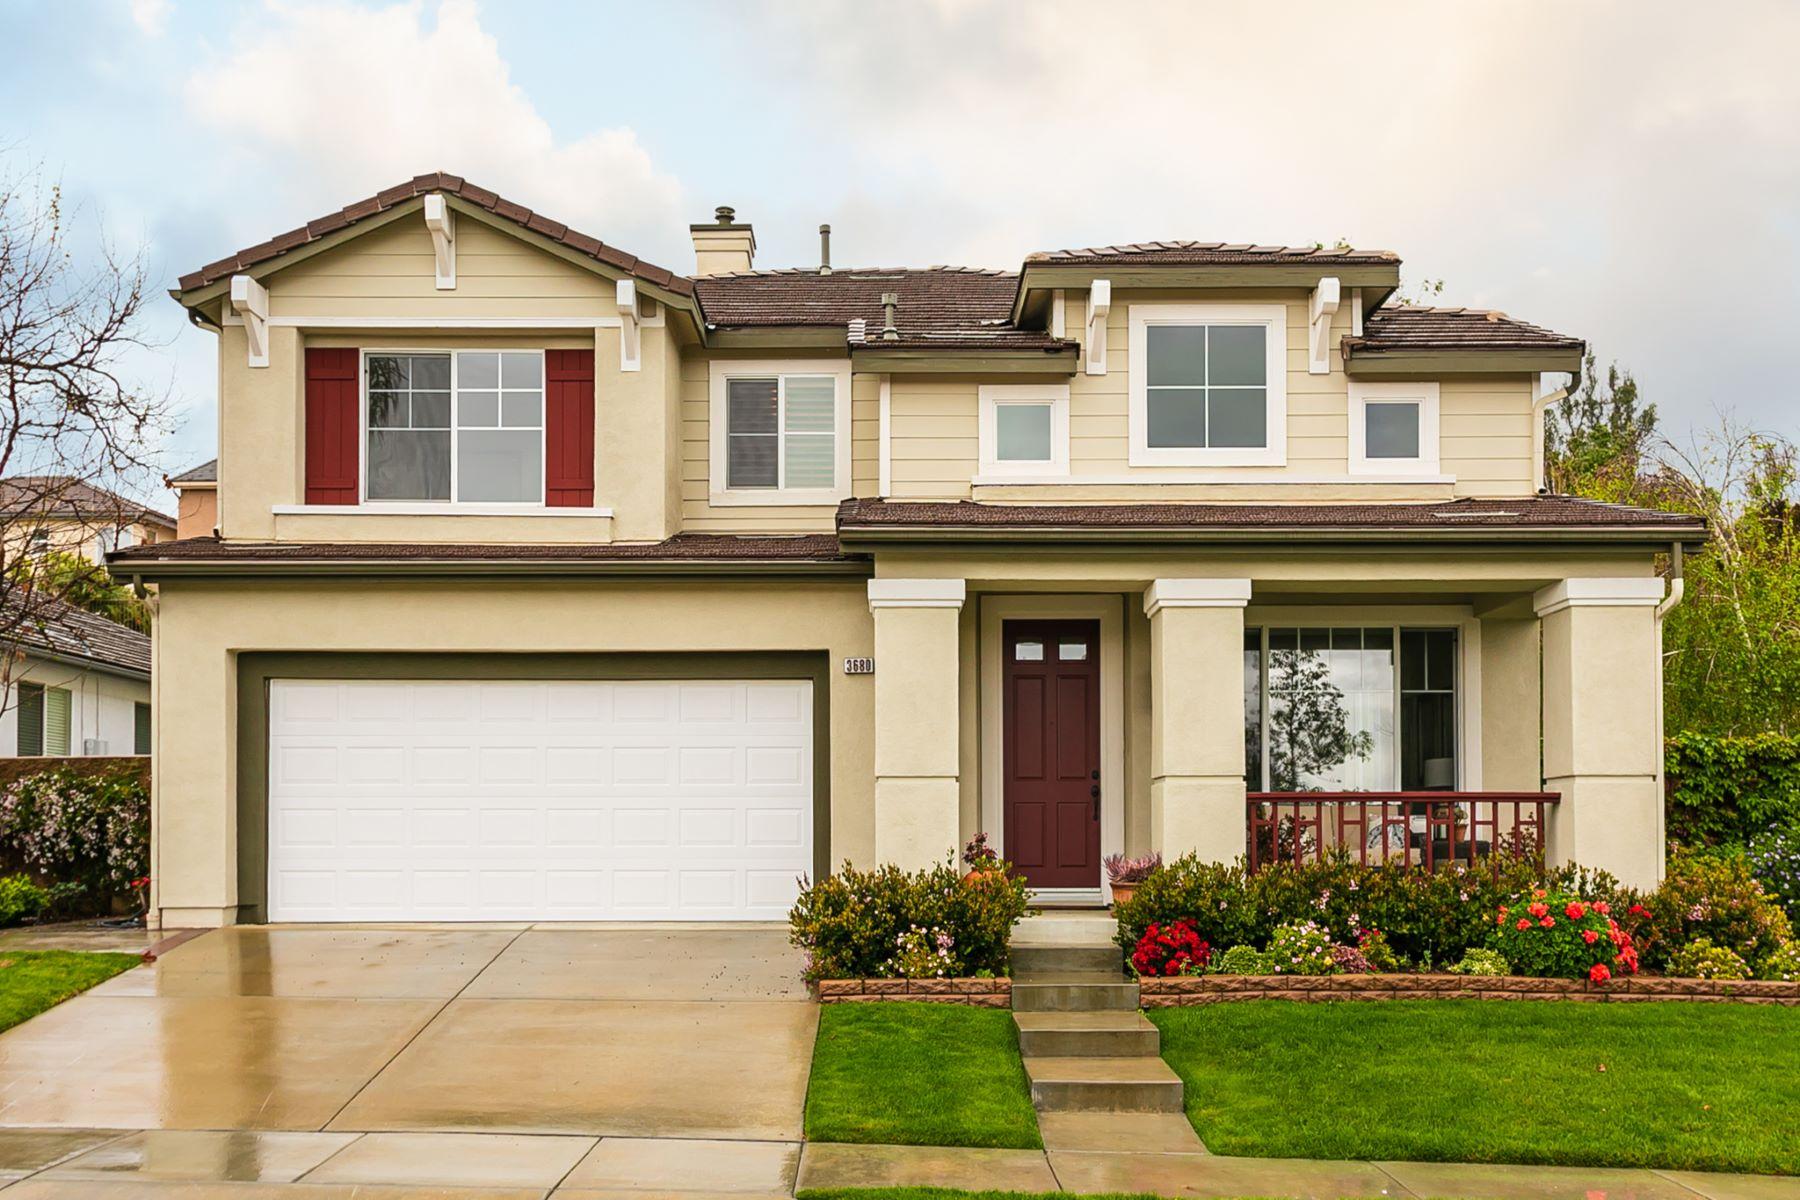 Single Family Homes for Active at 3680 Skylark Way Brea, California 92823 United States